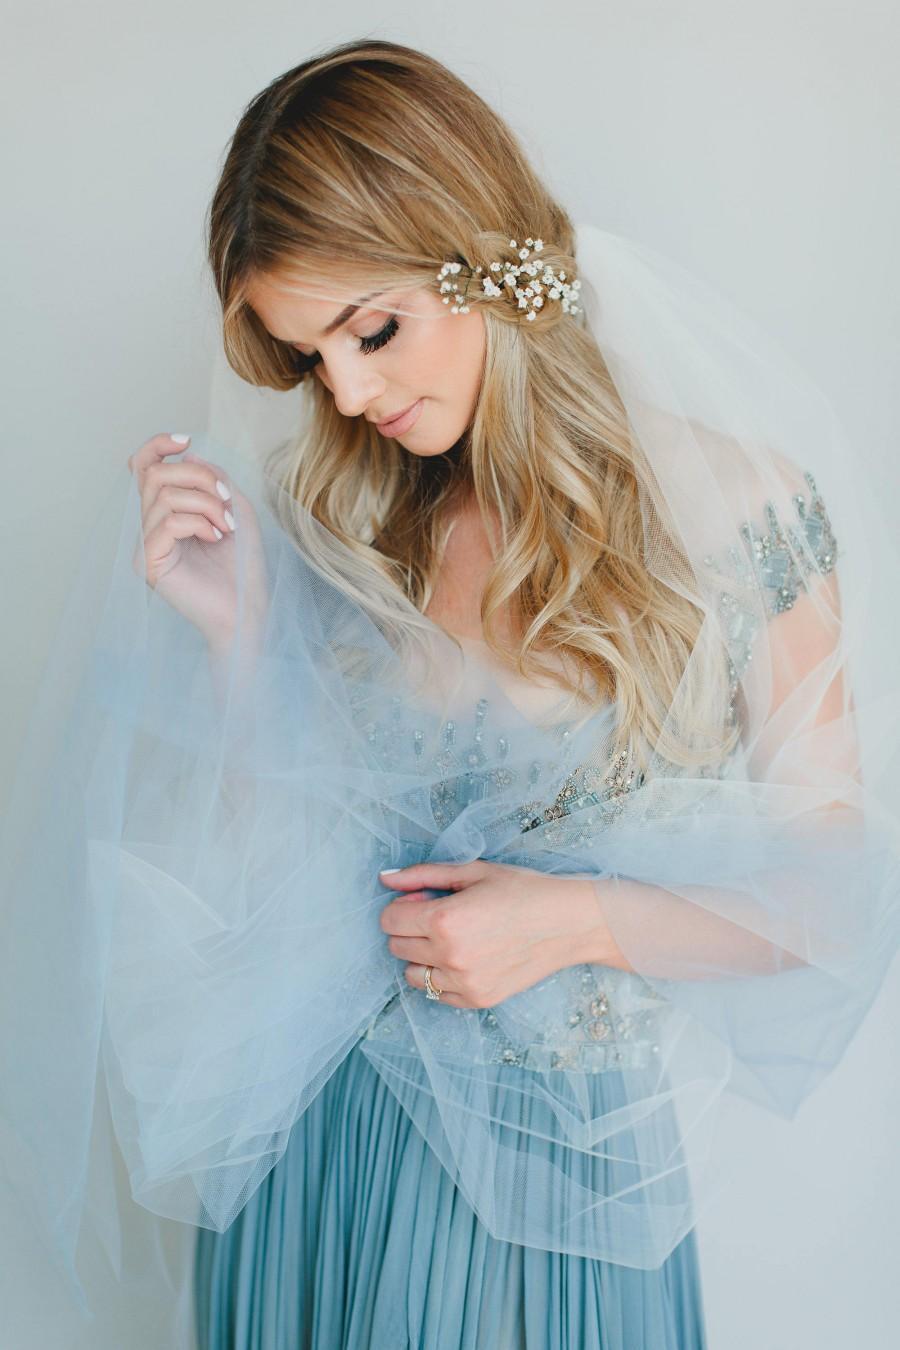 Hochzeit - Blue Ombre Veil, Hand Dyed Veil, Bridal Veil, Dip Dyed Veil, Cathedral Veil, Fingertip Bridal Veil, Tulle Veil, Blue Veil, Waltz Veil 1712